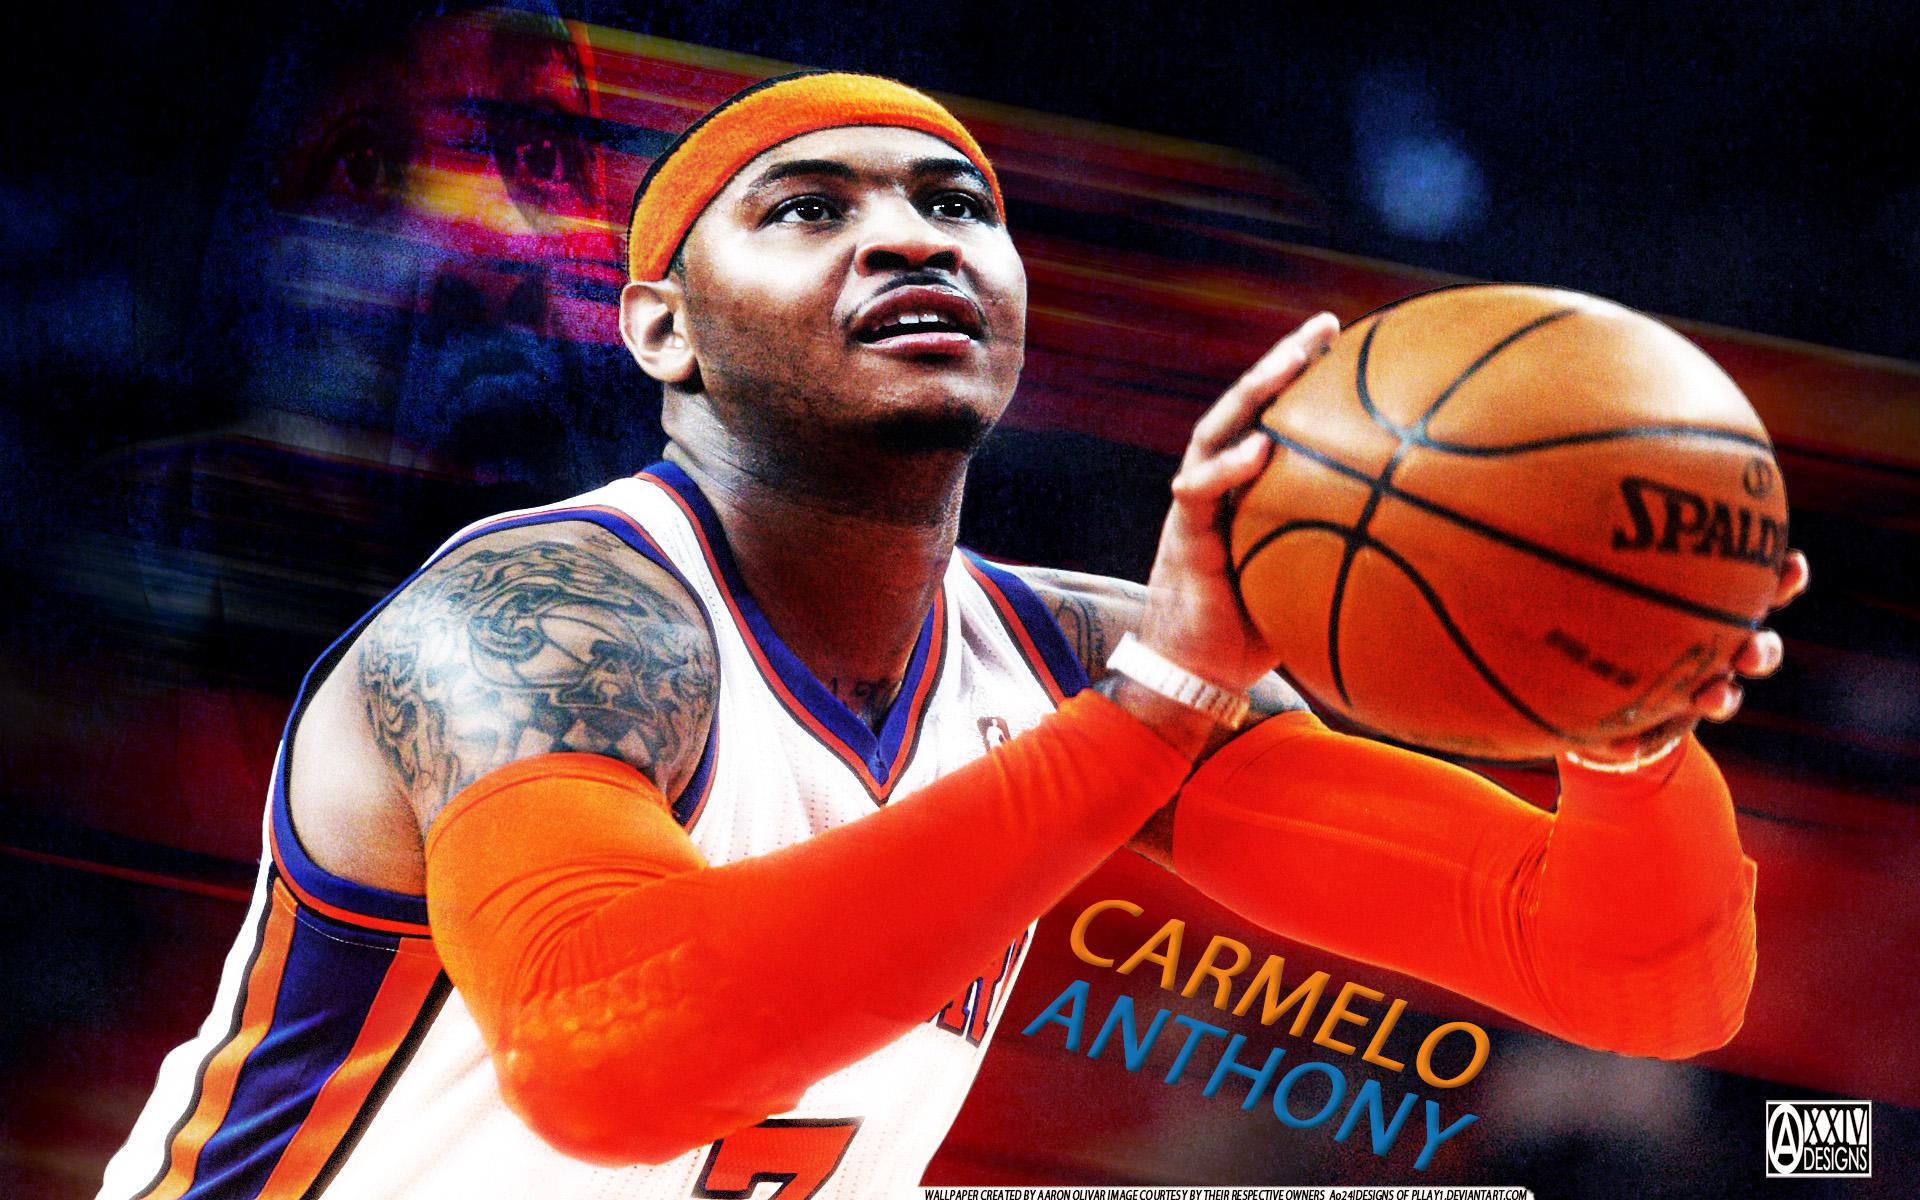 Carmelo Anthony Shoot Wallpaper